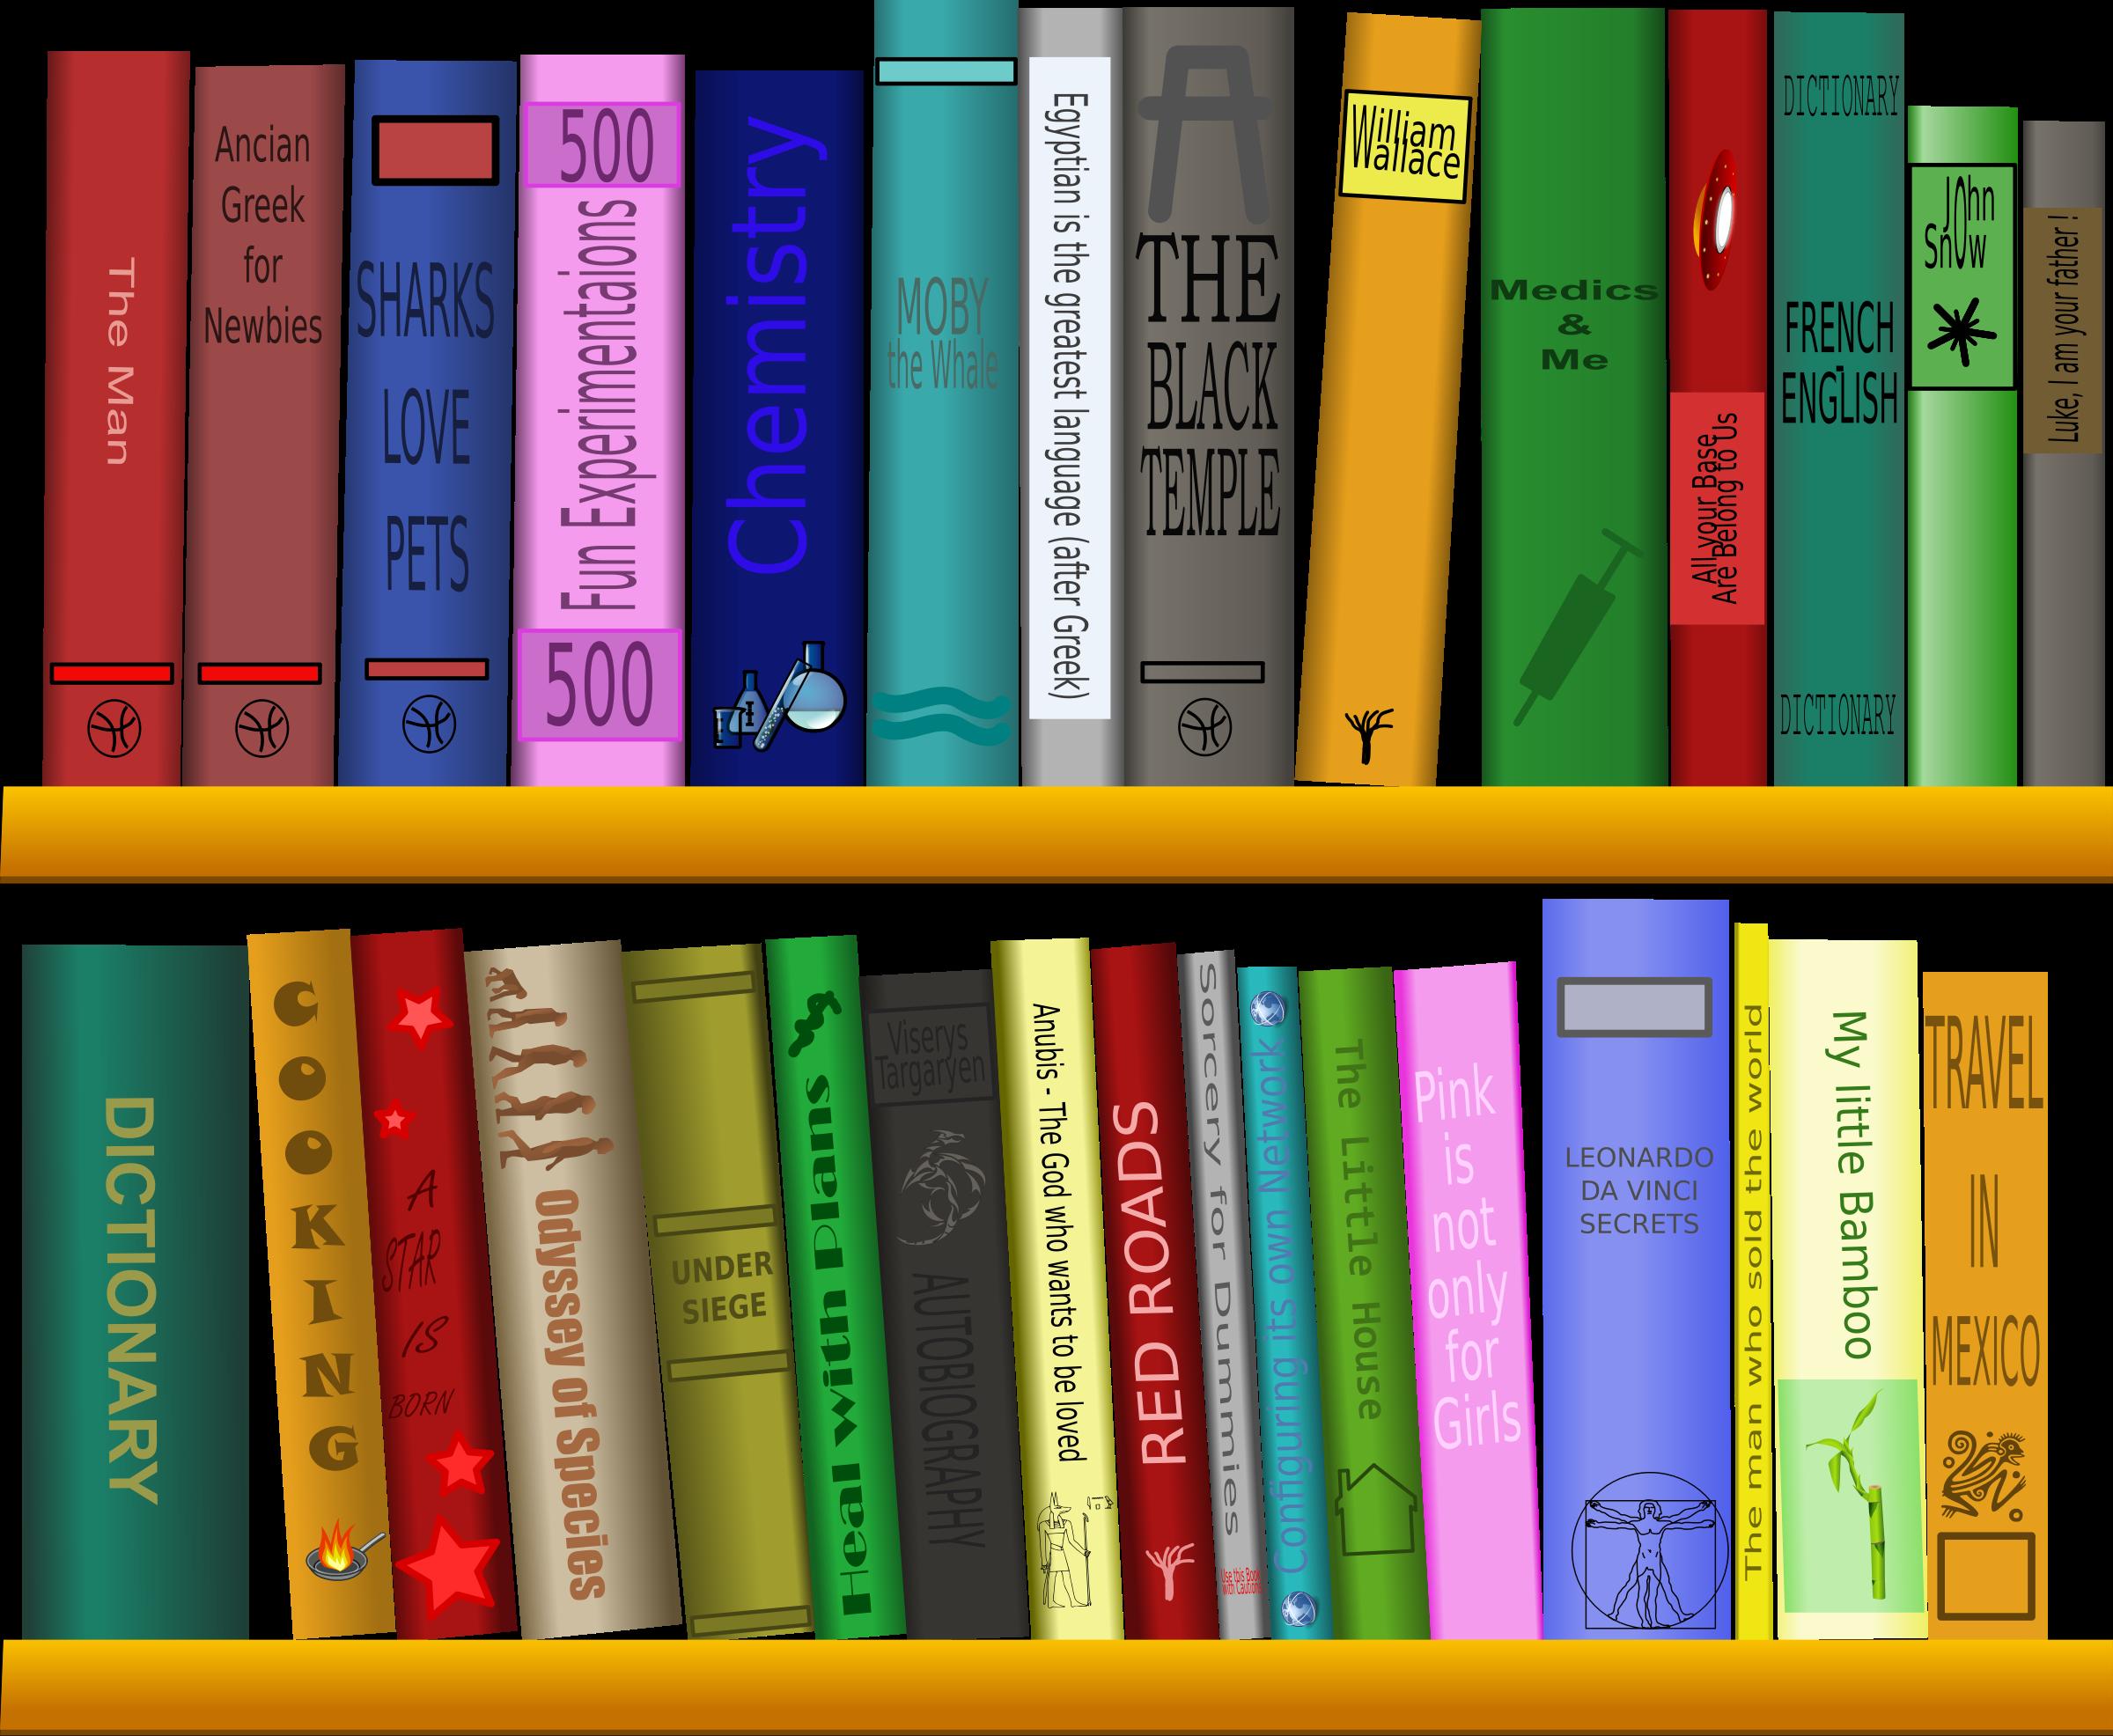 East Rockaway Public Library | Reading quotes, Book logo, Public library